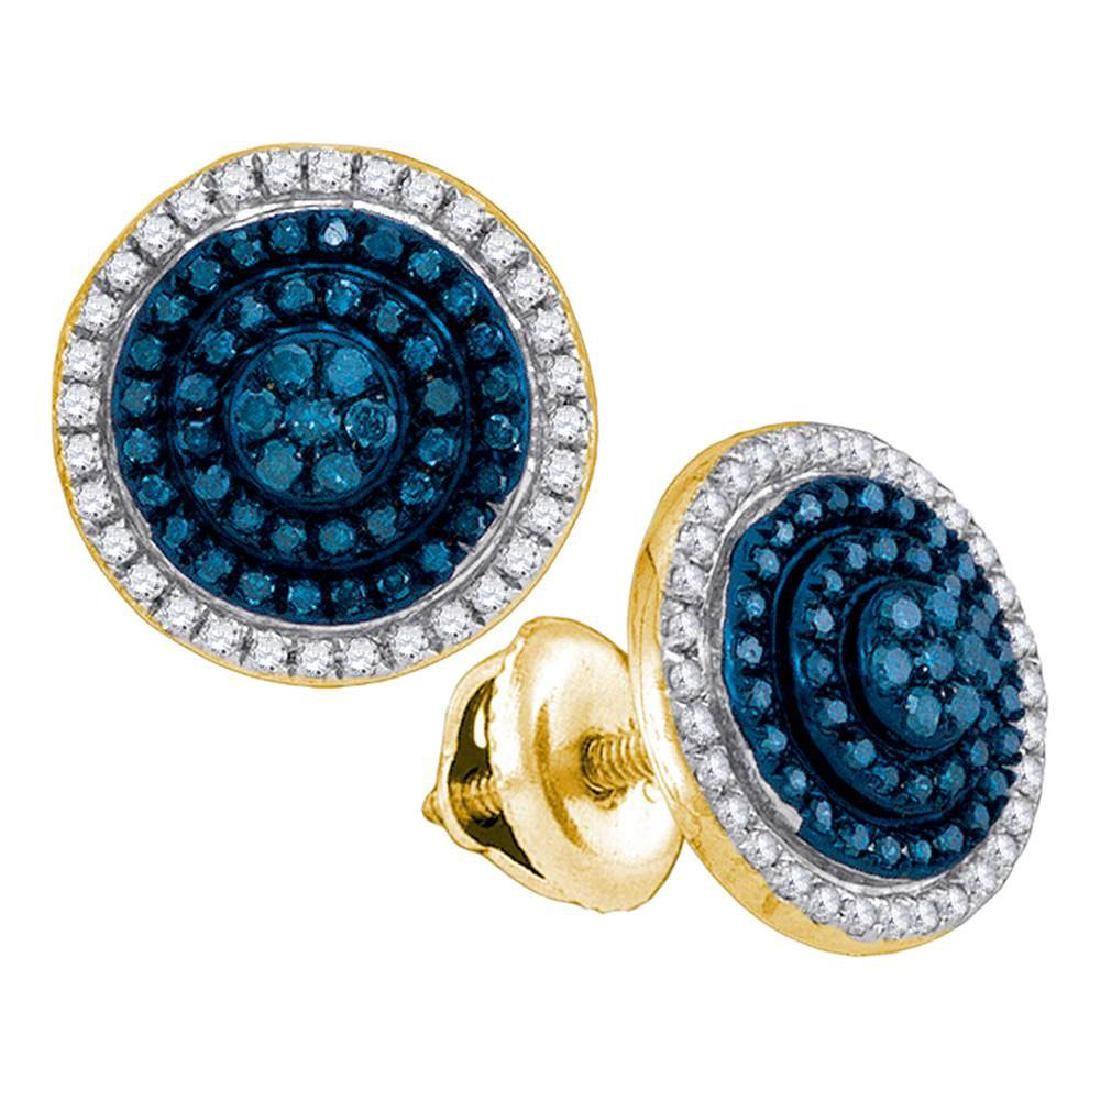 0.55 CTW Blue Color Diamond Cluster Earrings 10KT